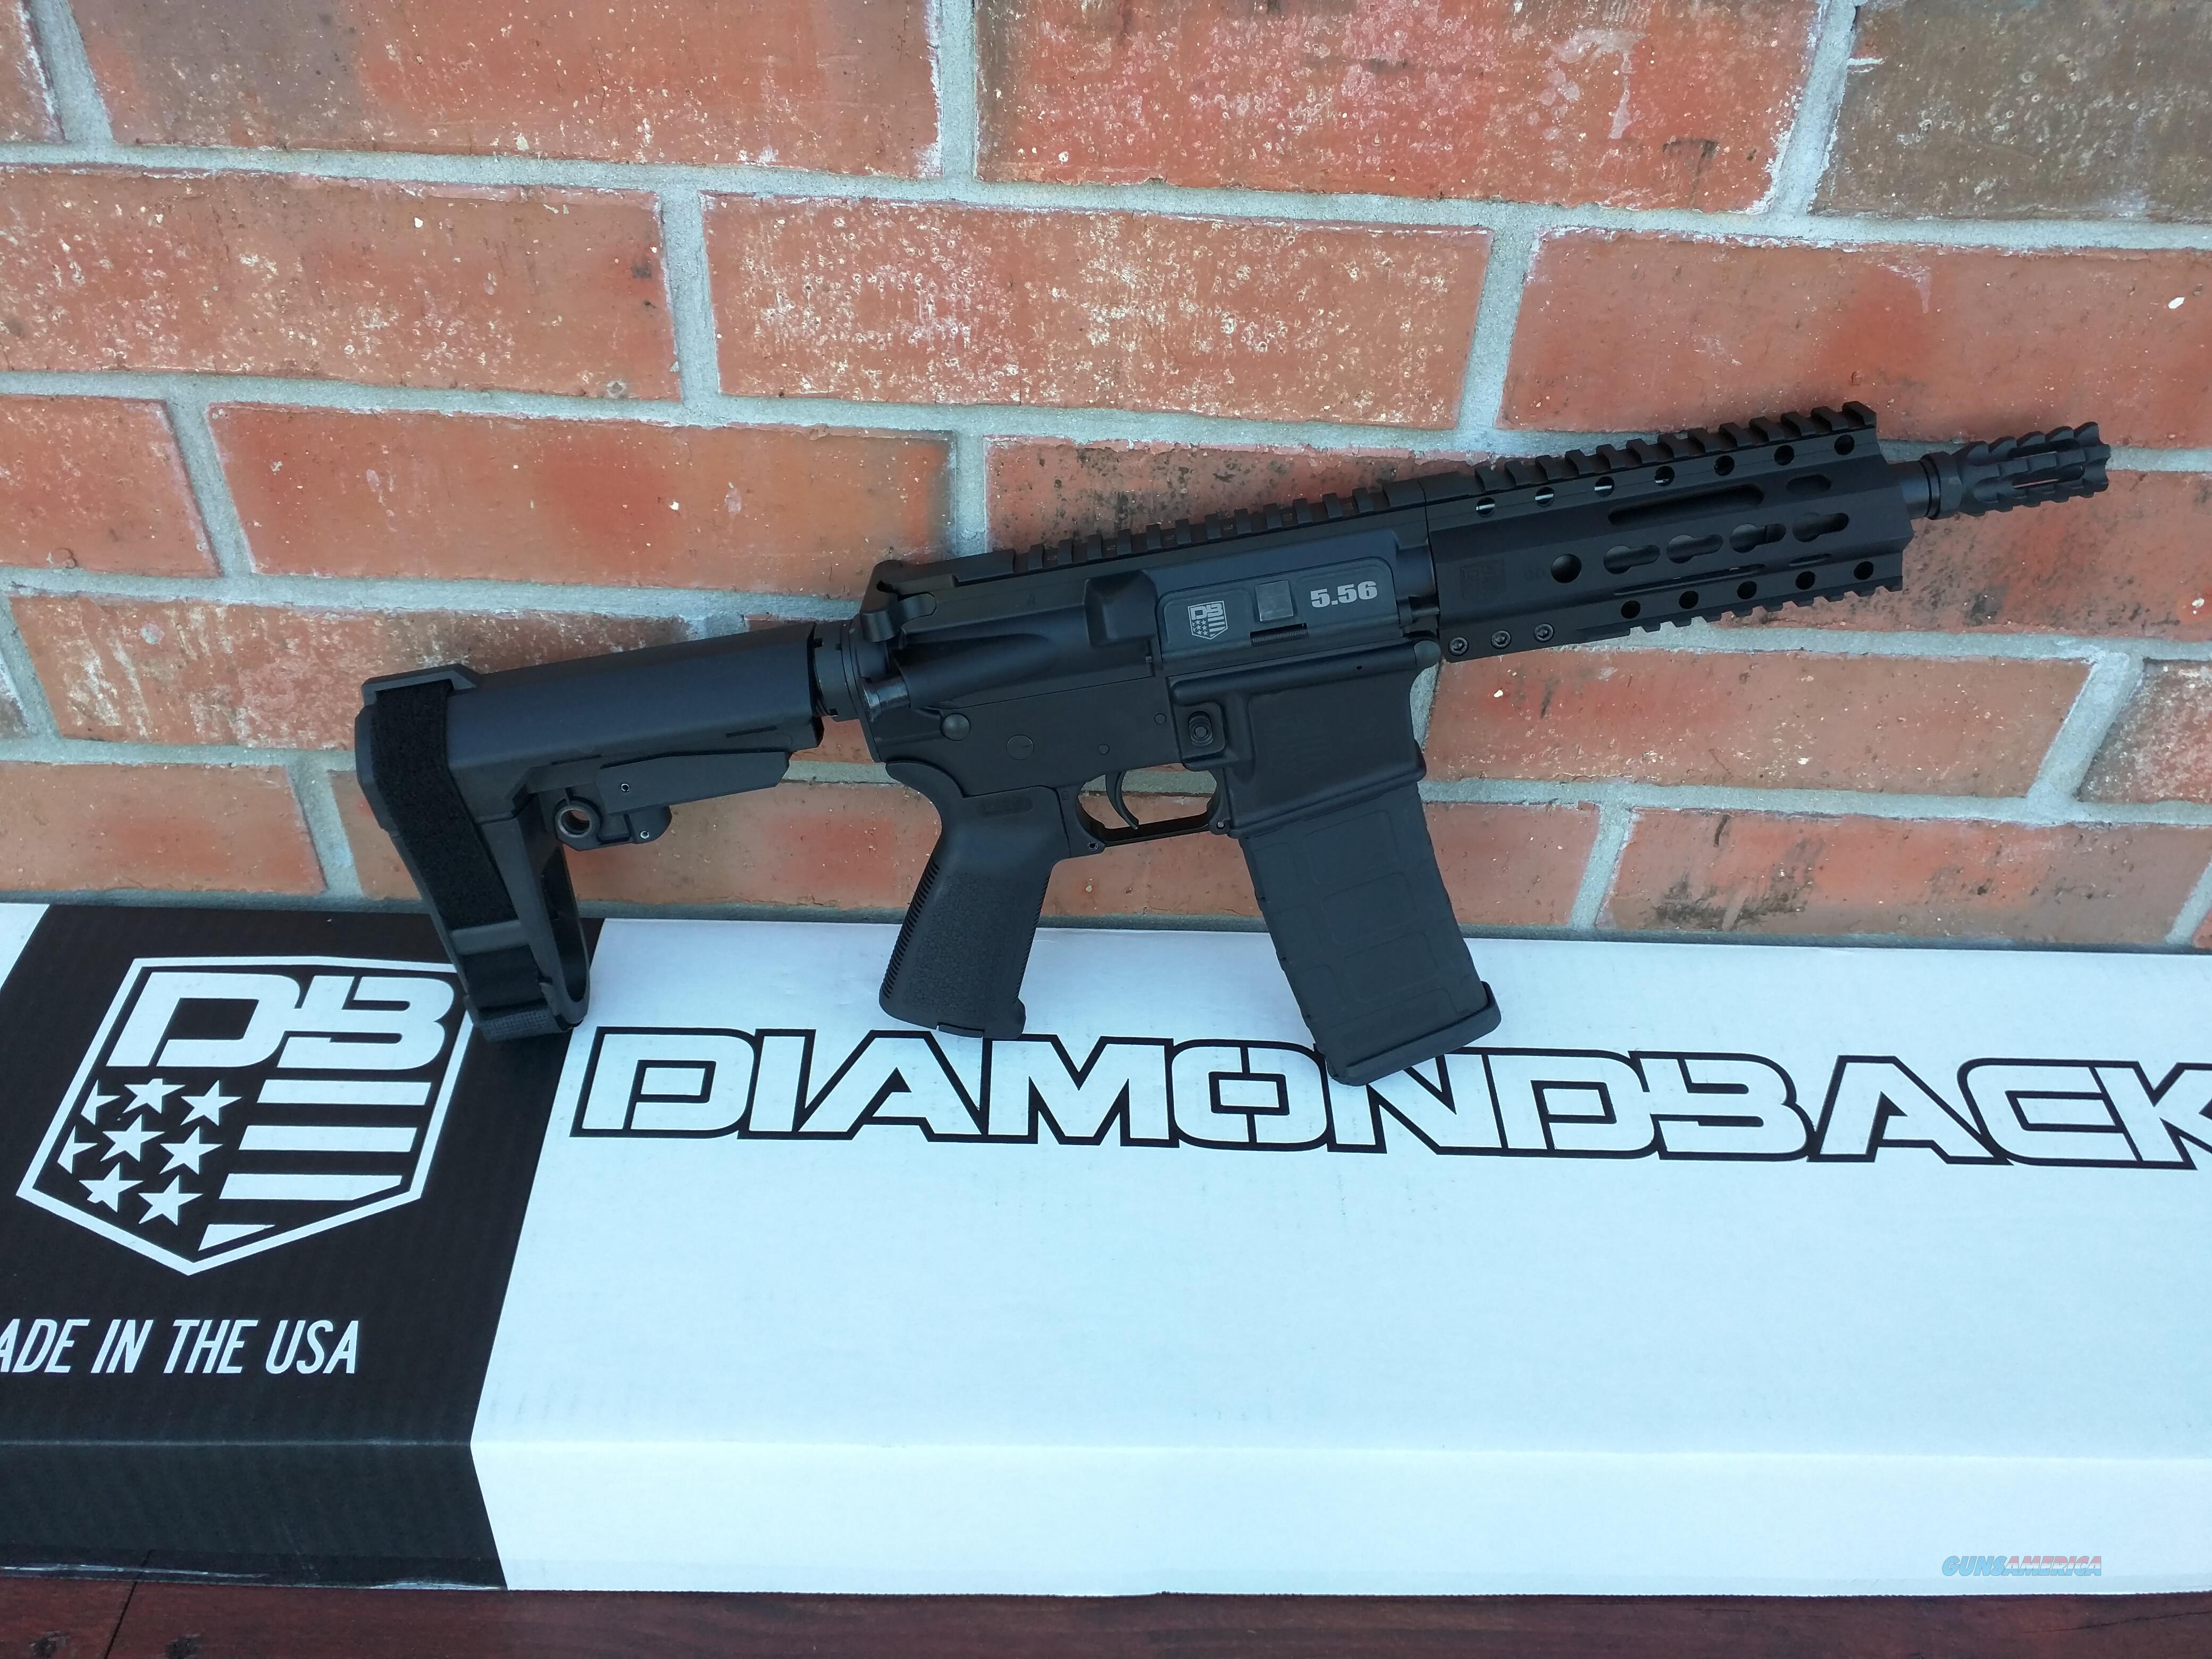 "Diamondback  DB 15 AR 15 AR15 Pistol 7.5"" Black SB Tactical SBA3 Pistol Adj Brace 223/5.56 30 rd NIB Alum Rail Muzzle Brake Lifetime Warranty FREE LAYAWAY!!  Guns > Rifles > AR-15 Rifles - Small Manufacturers > Complete Rifle"